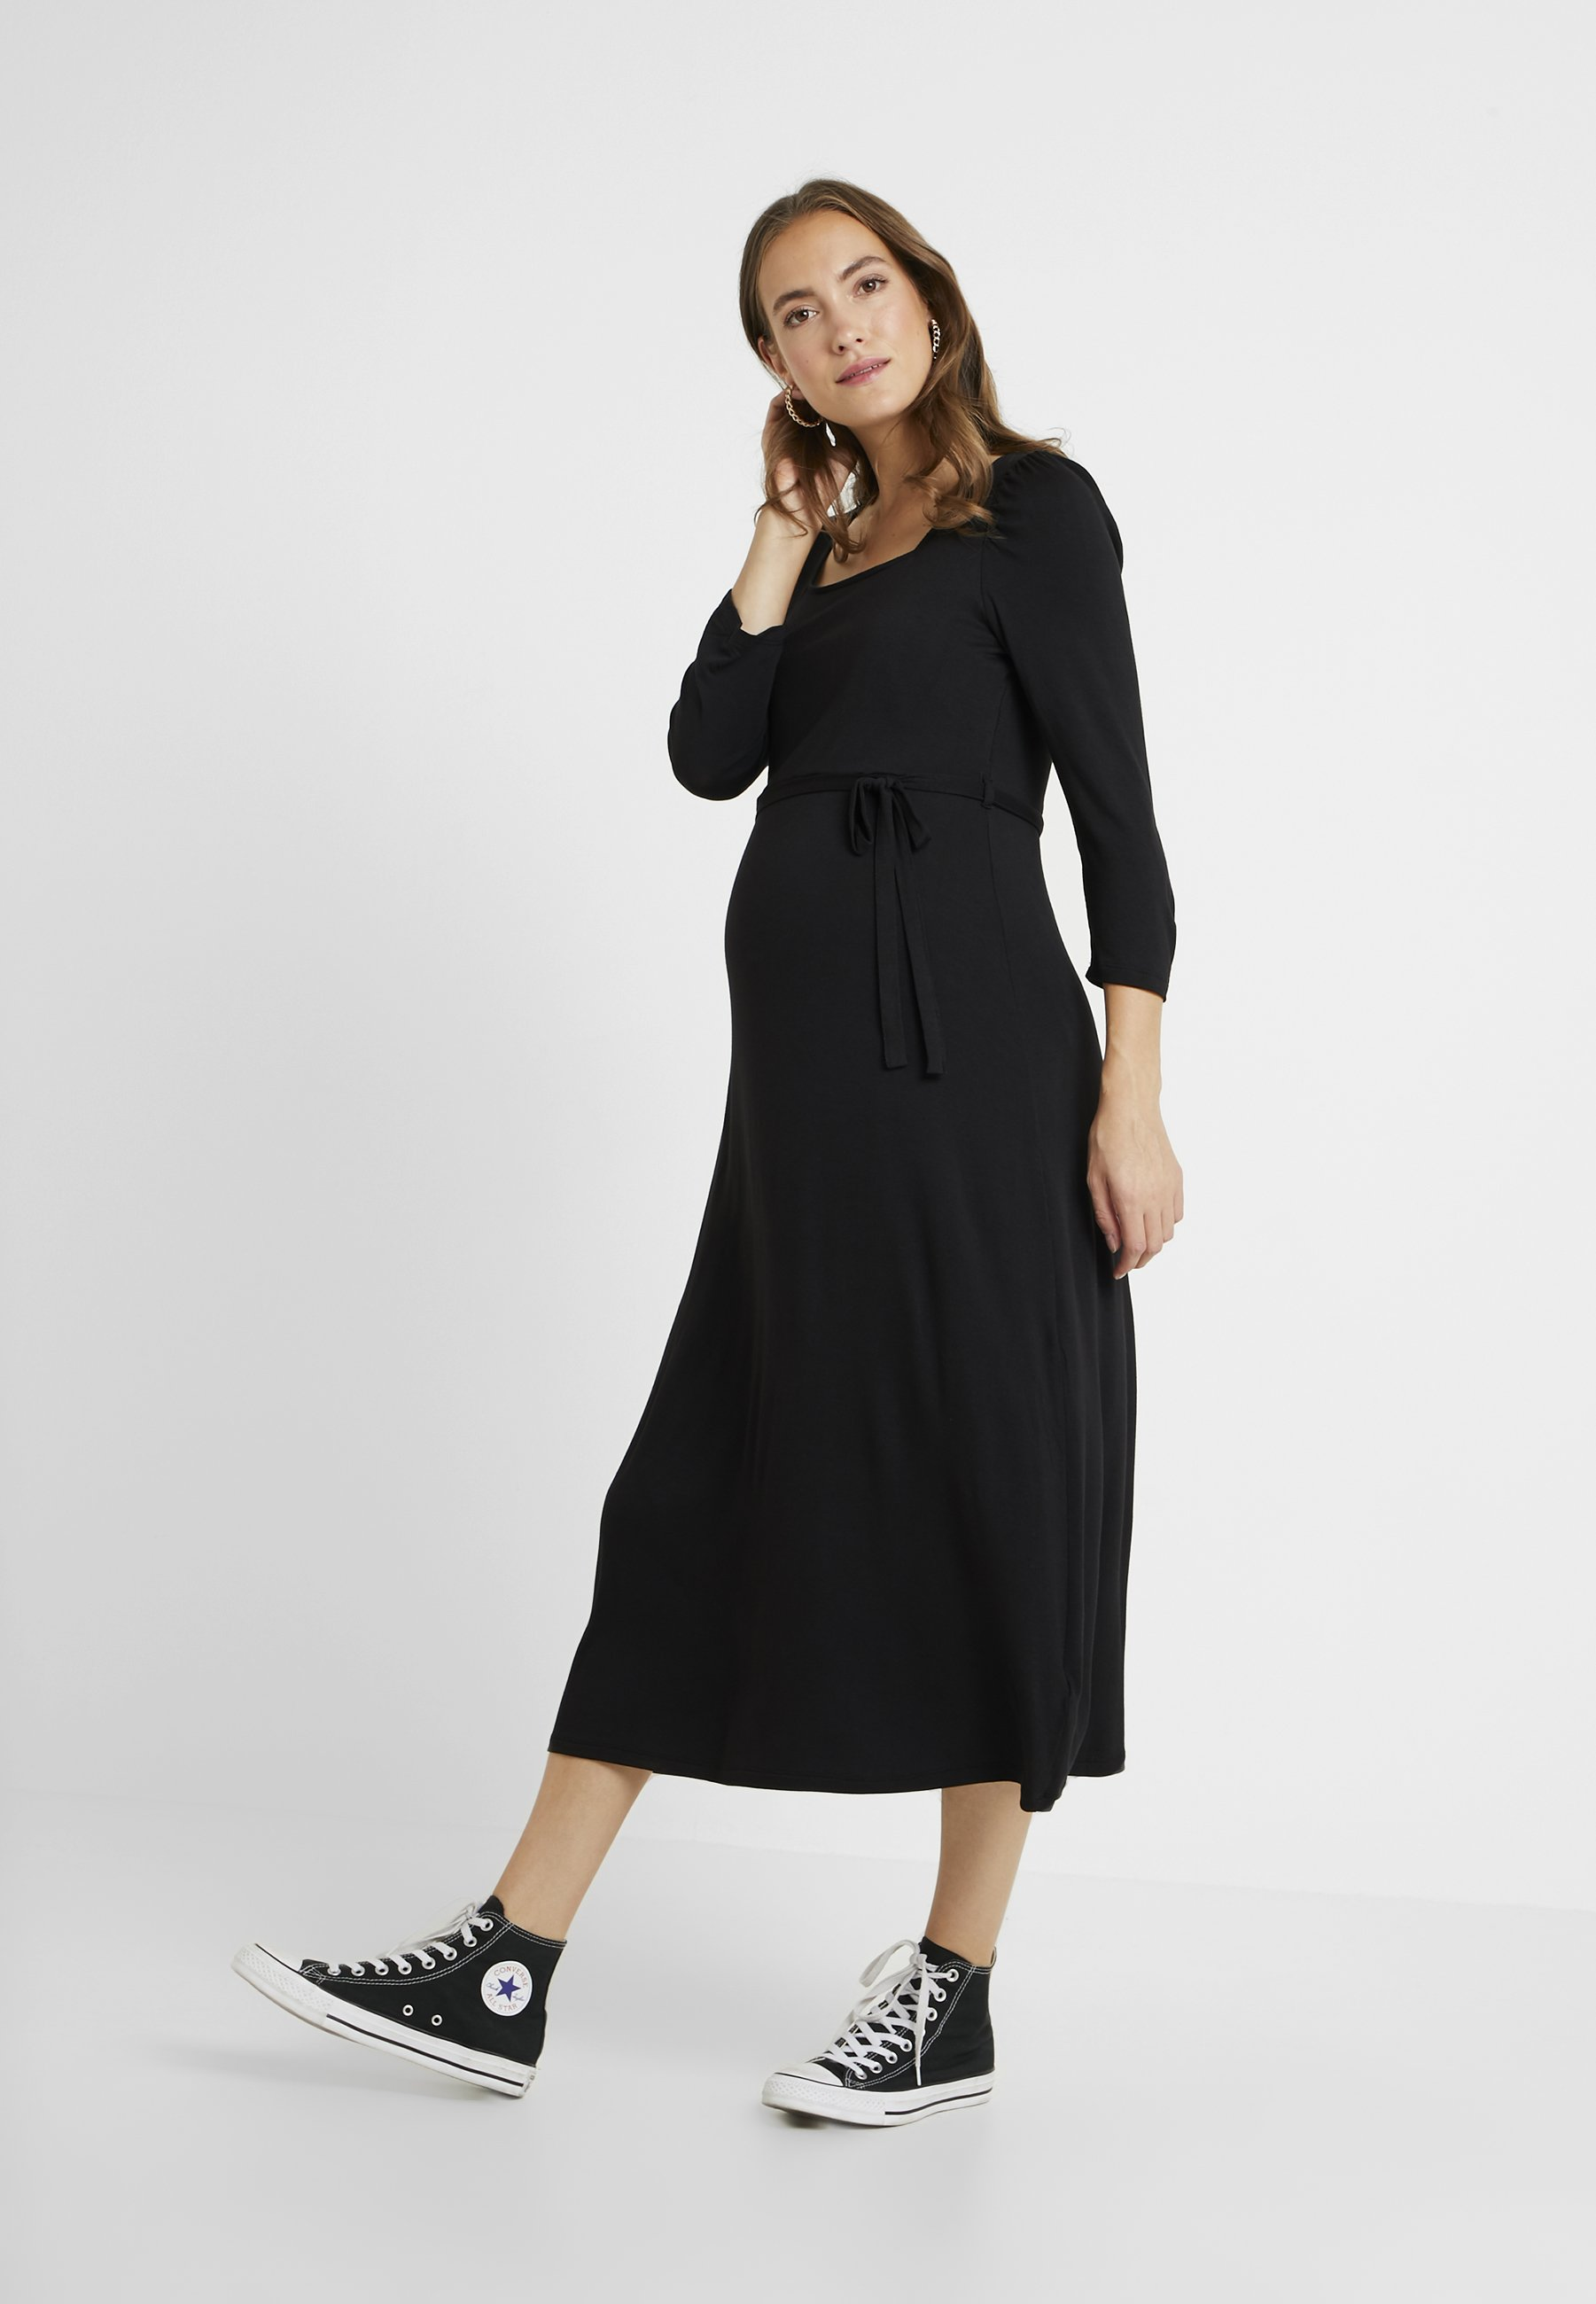 Dorothy Perkins Maternity Molly Grazer Dress - Jerseyjurk Black LM88NXCt